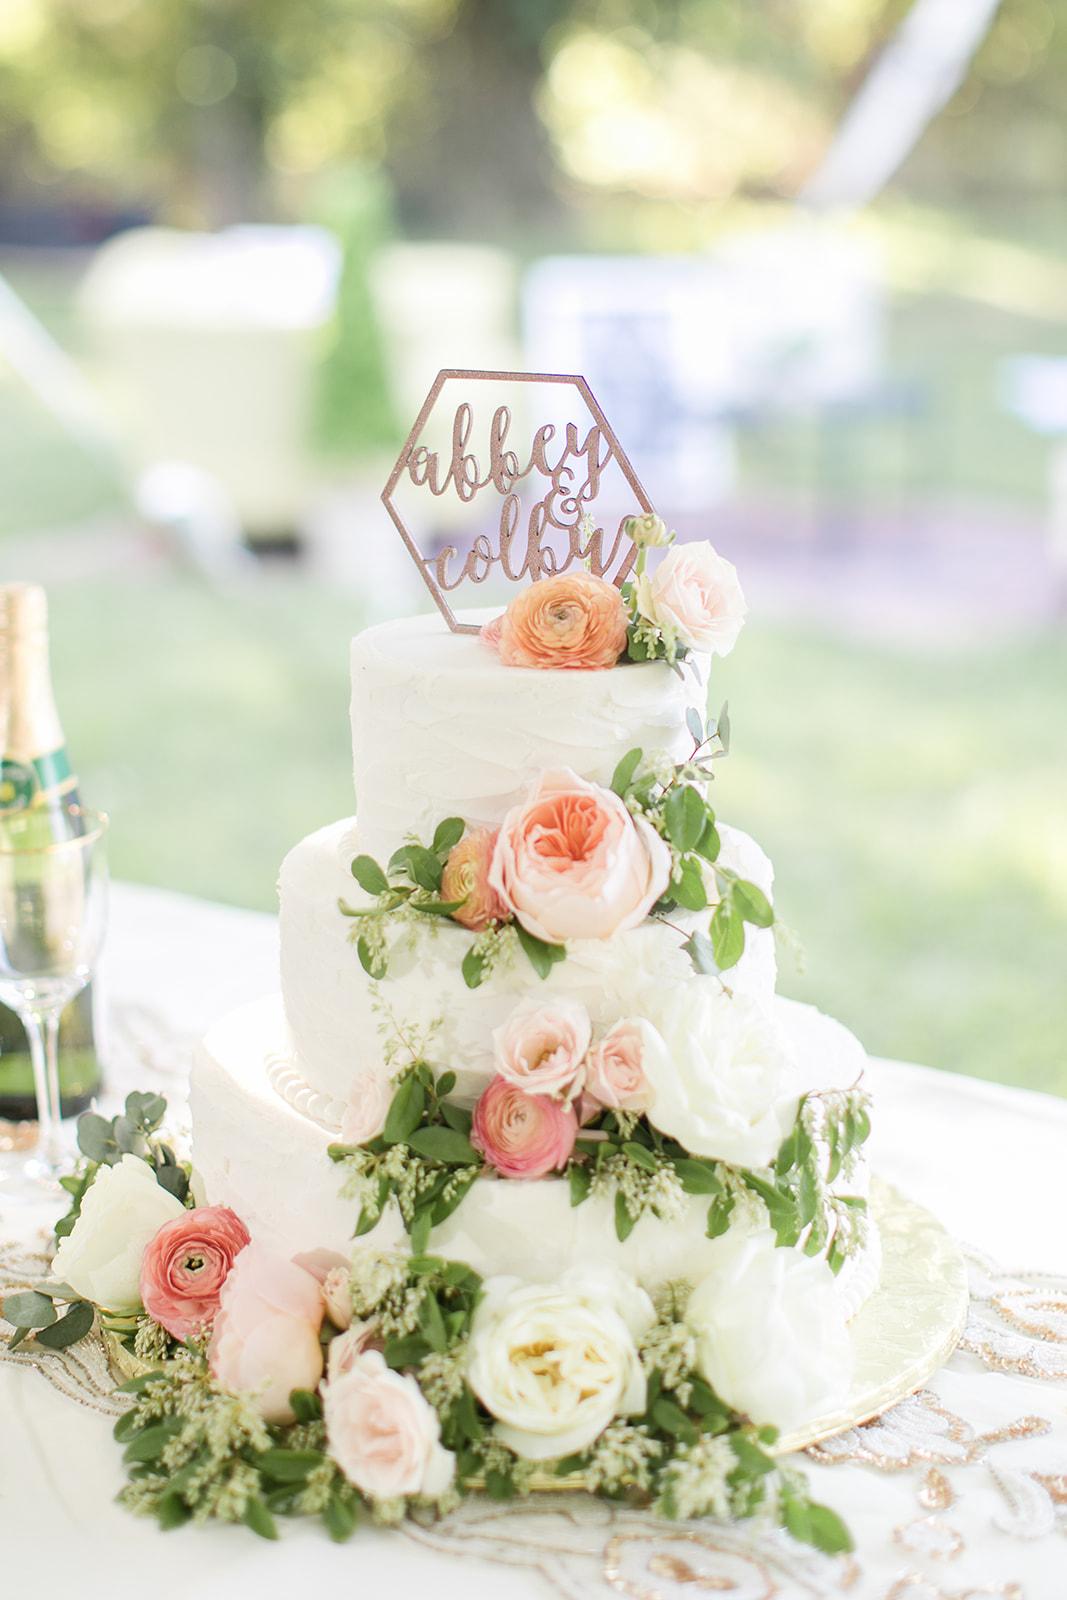 Abbey-Colby-wedding-503_websize.jpg